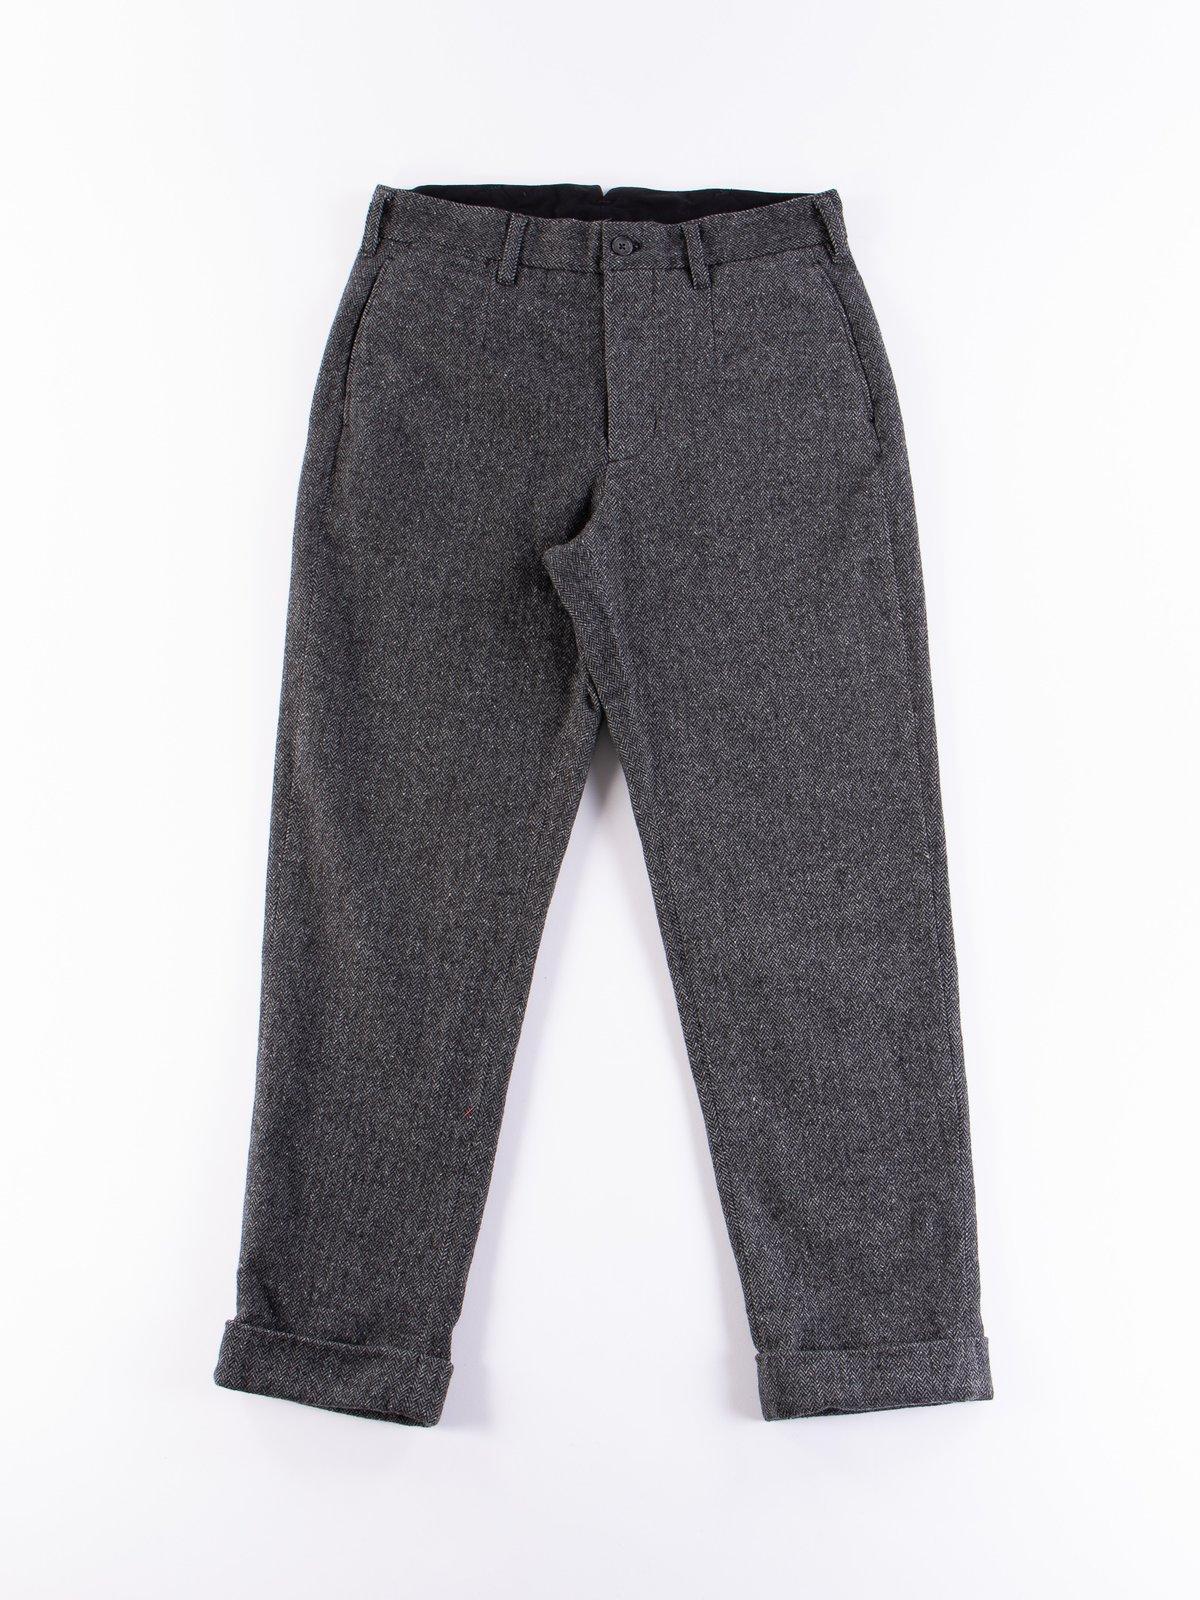 Grey Poly Wool Herringbone Andover Pant - Image 1